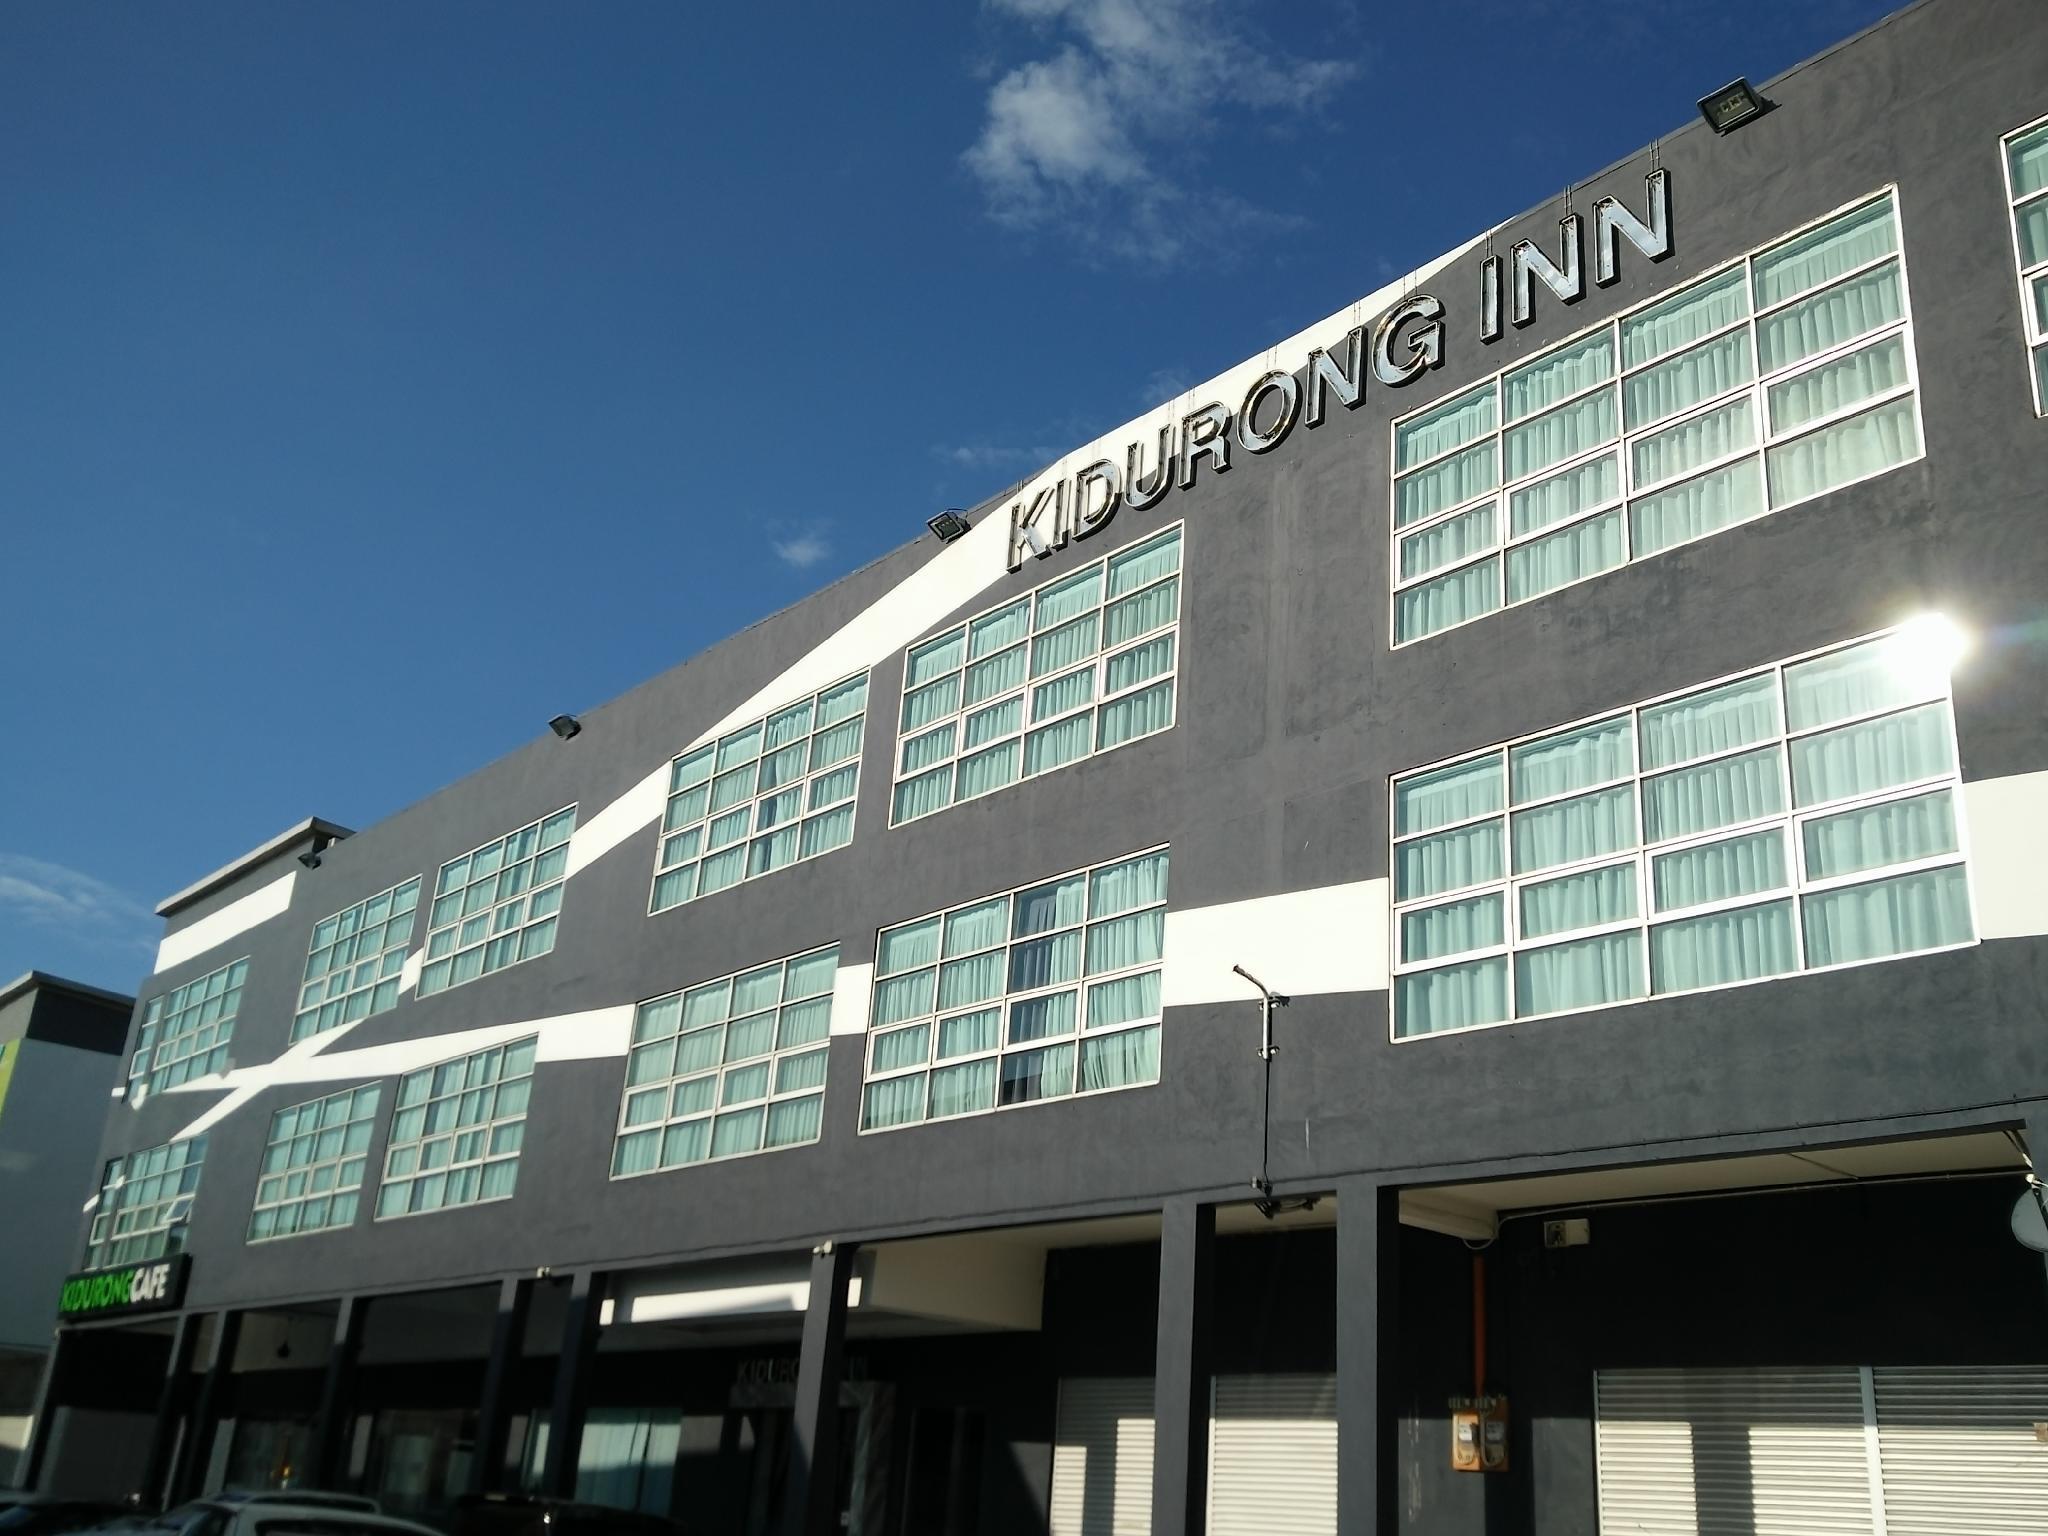 Kidurong Inn